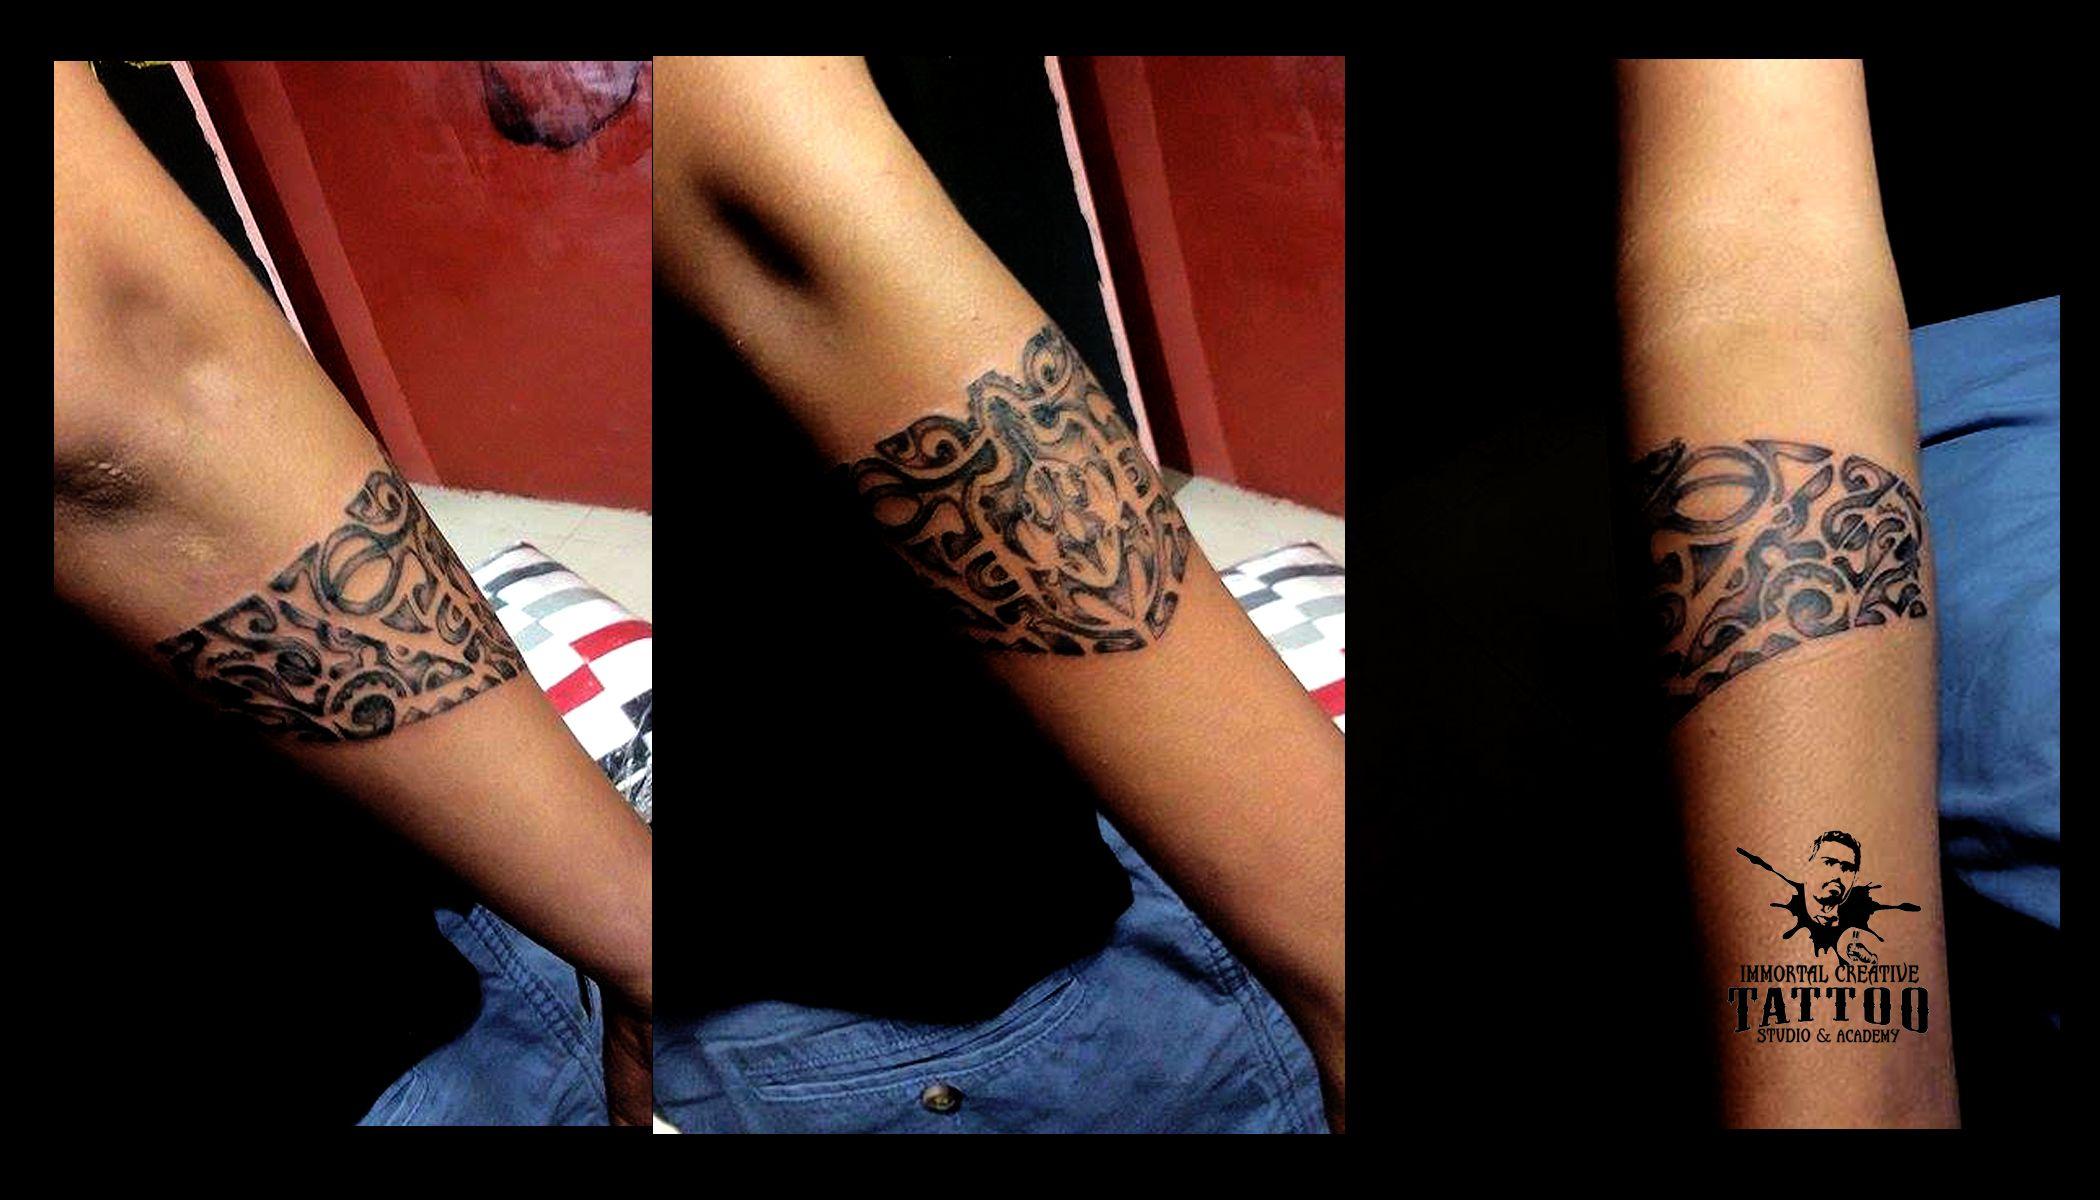 Maori Band Tattoo At Immortal Creative Tattoo Studio Indore Dinakaran Ur Views Comments And Shares Would Band Tattoo Design Your Tattoo Creative Tattoos